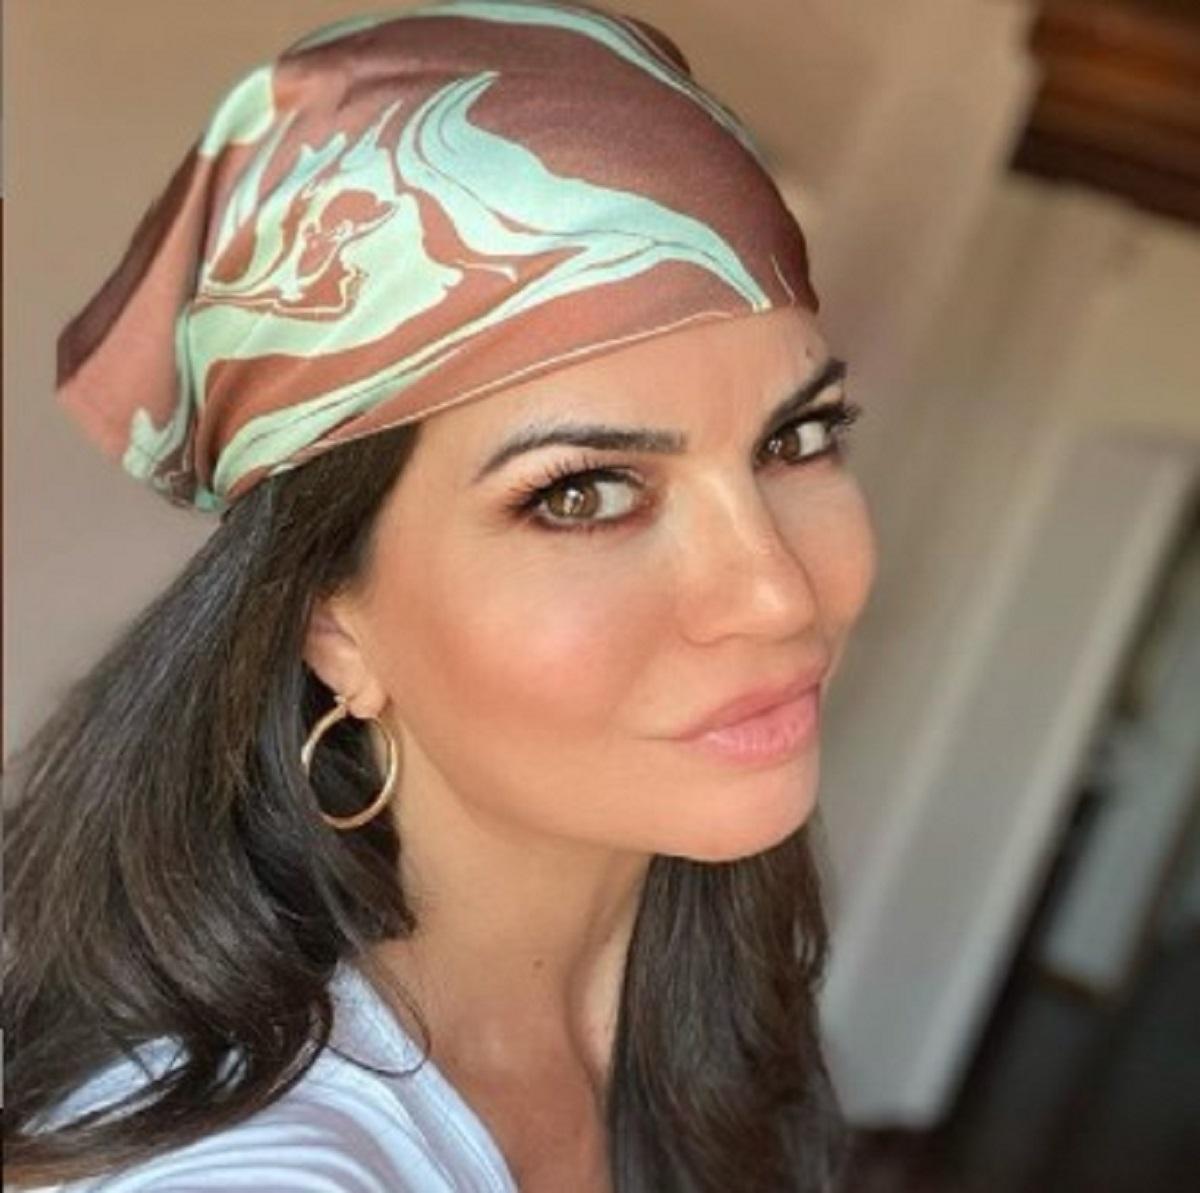 Laura Torrisi foto topless fan incantati vacanza Sicilia